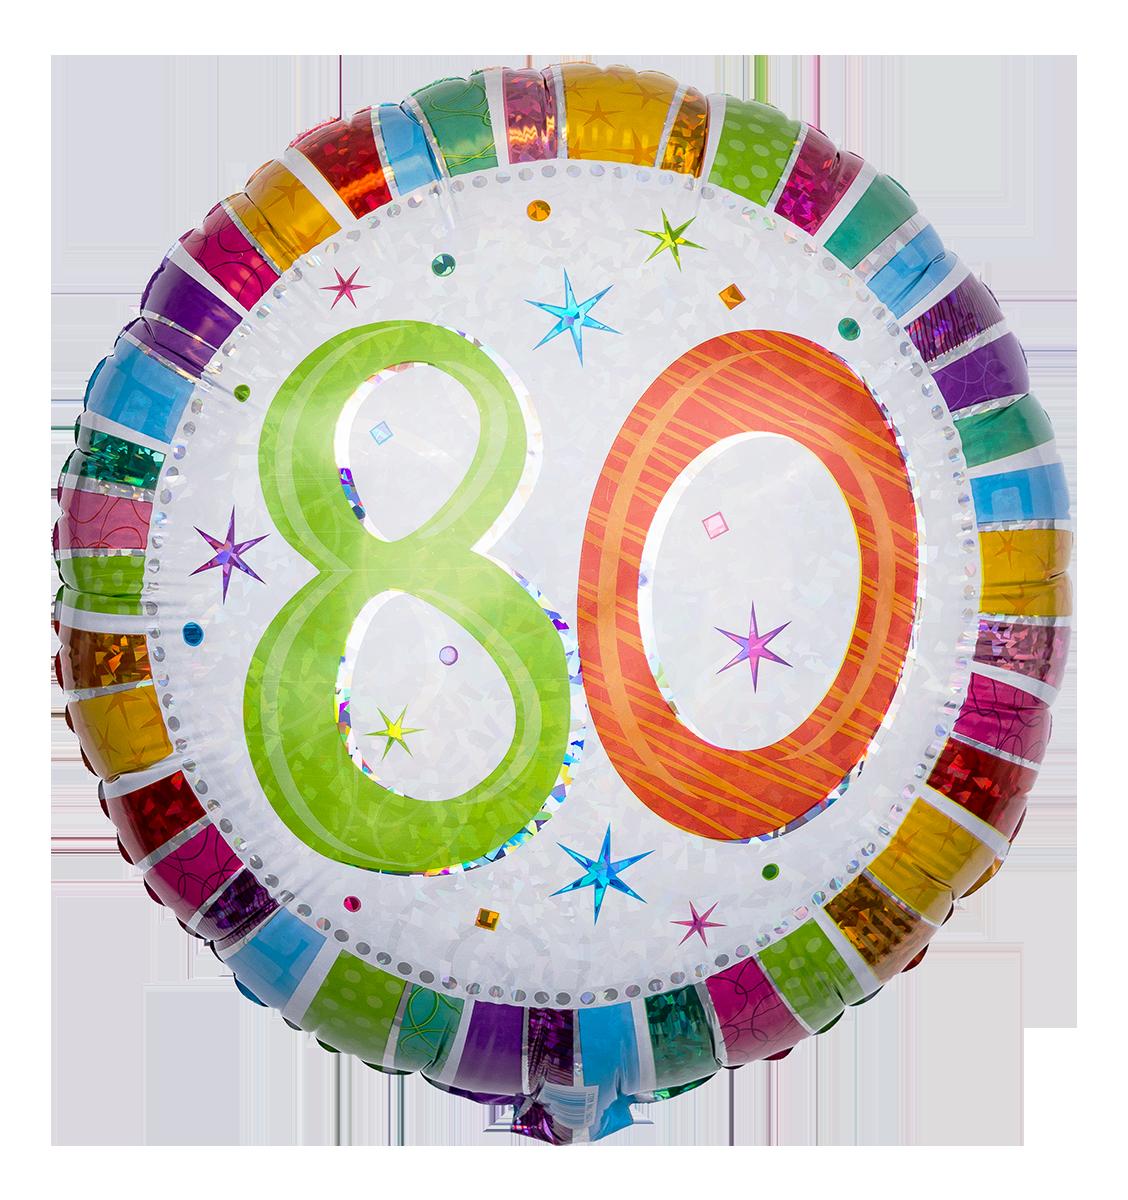 Cliparts zum 80 geburtstag png download Clipart zahlen 80 png download